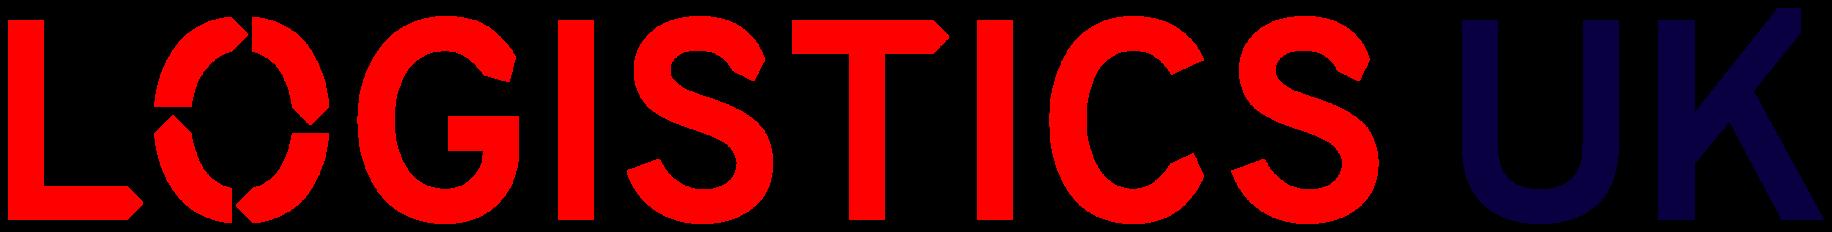 LogisticsUK logo 2020